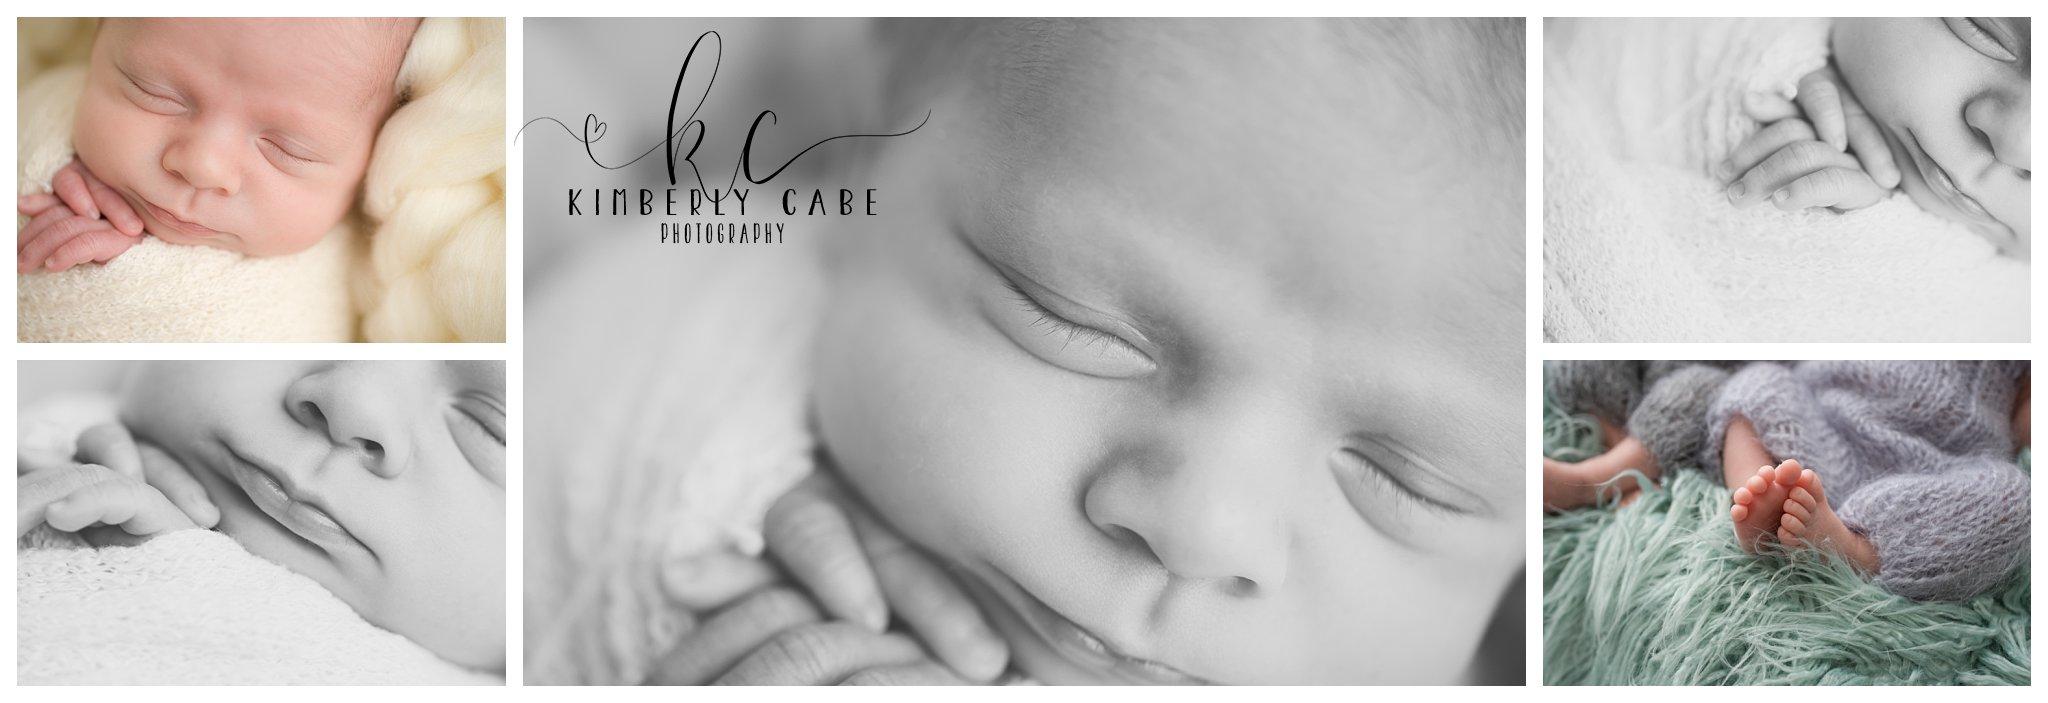 newborn photography greenville south carolina